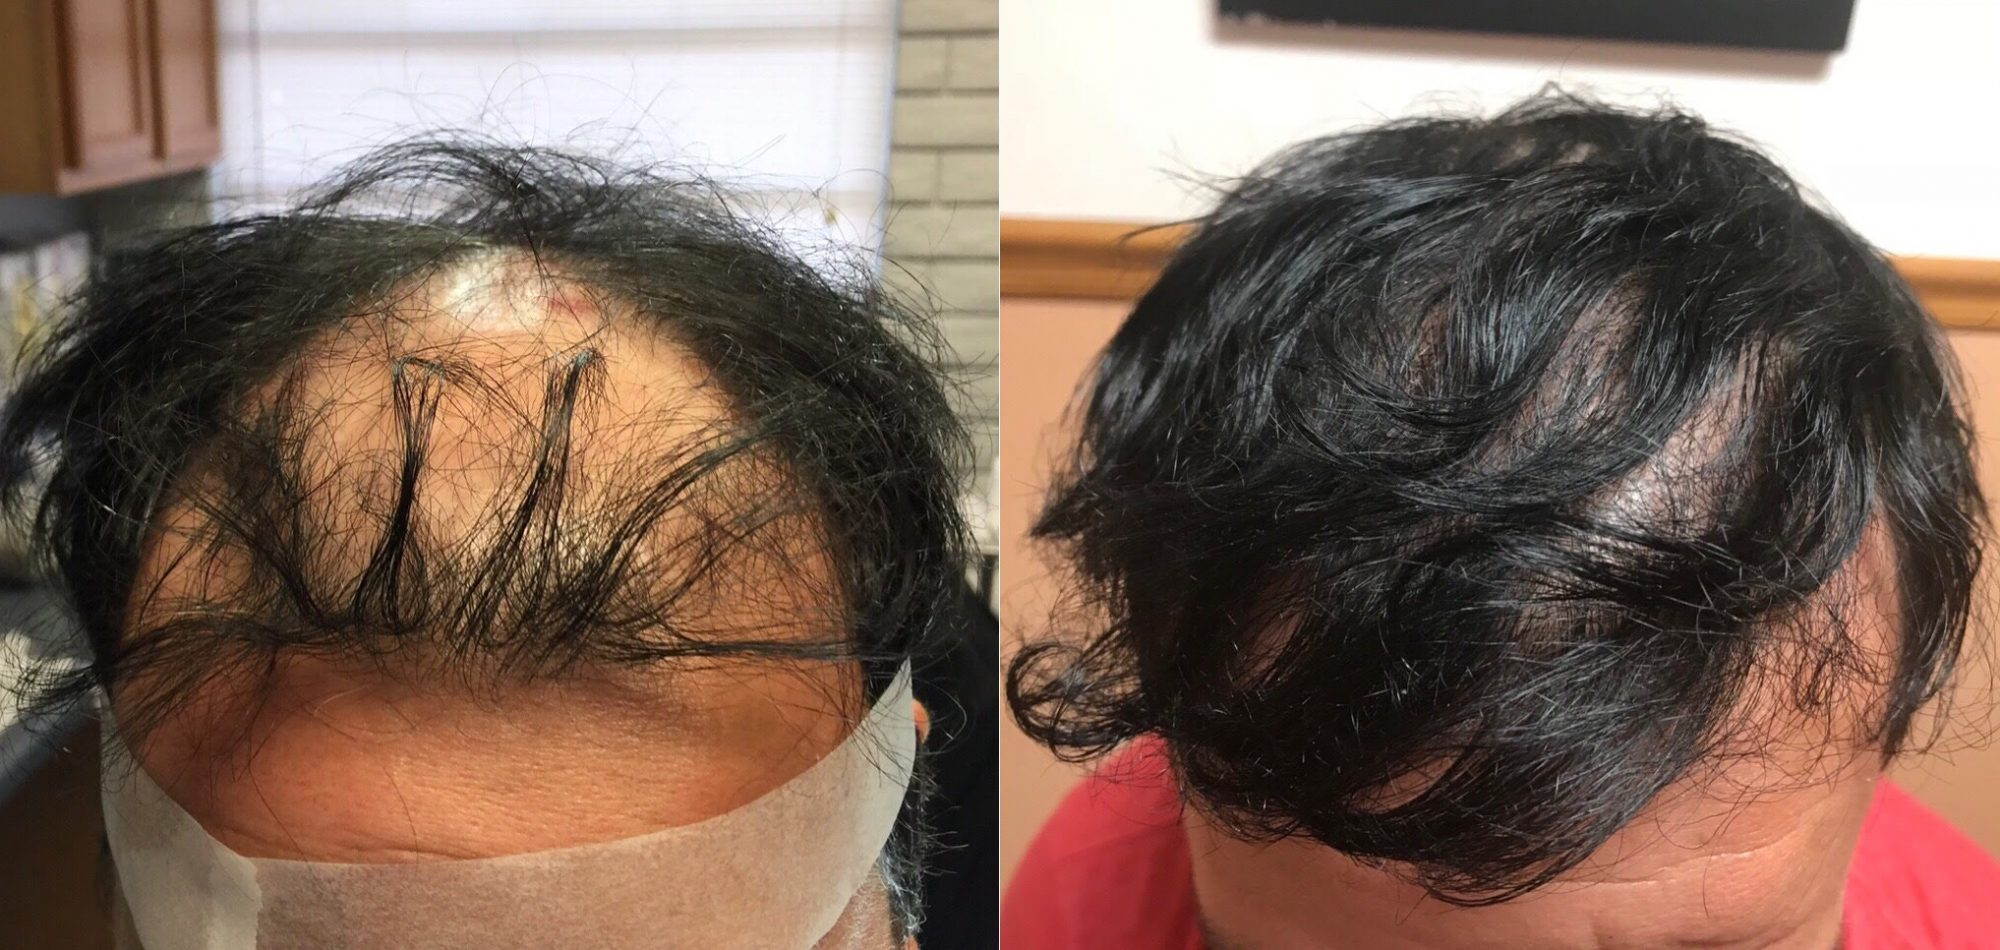 fut-hair-transplant-4000-grafts